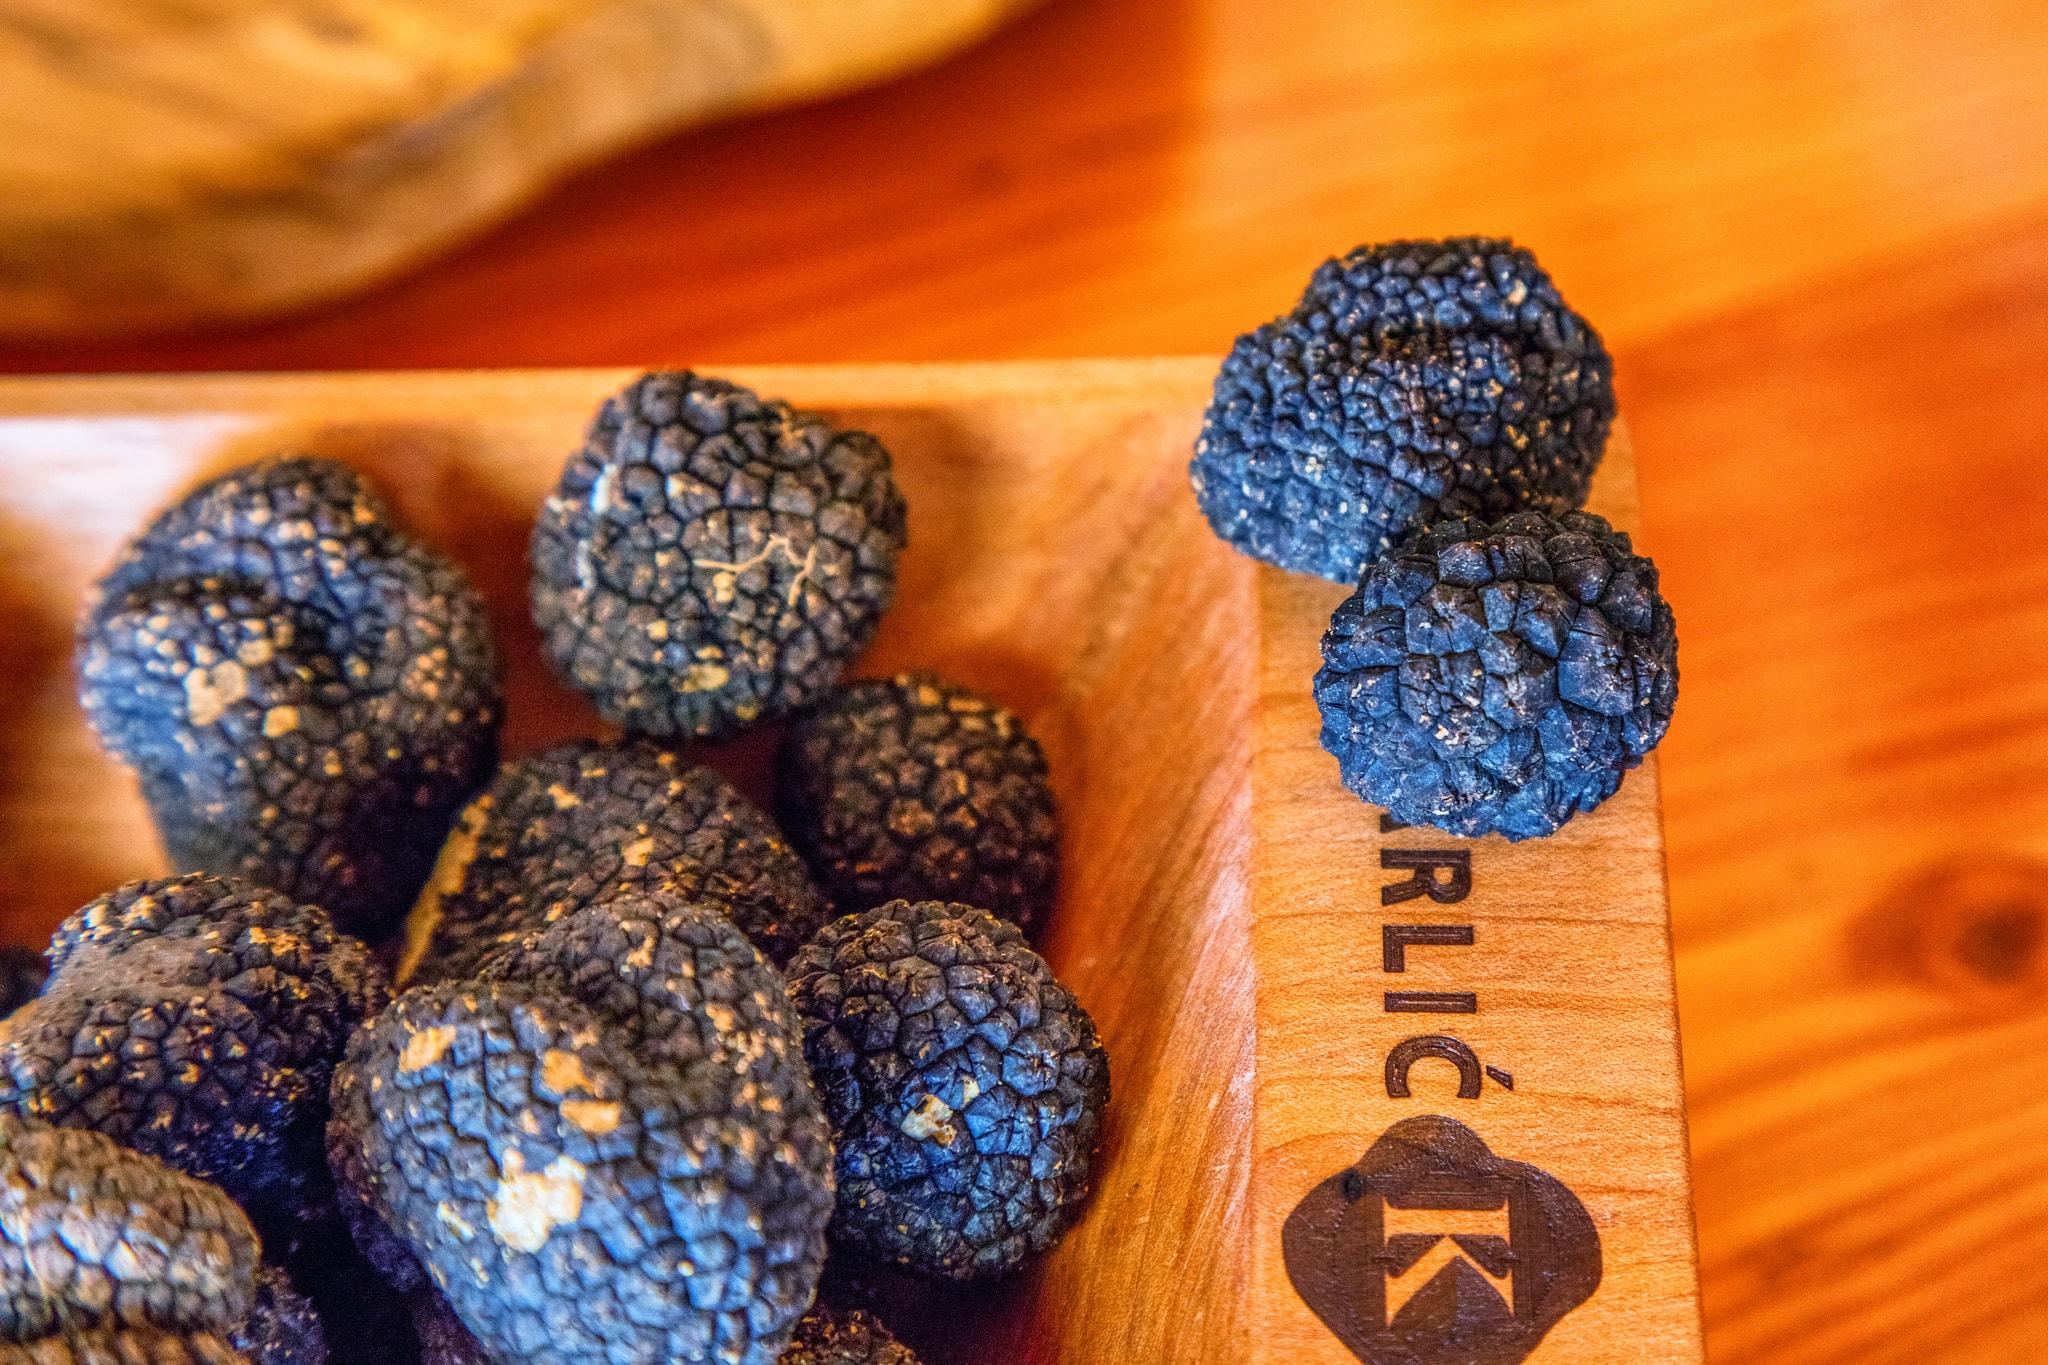 Luxurious black truffles for truffle season visit Croatia